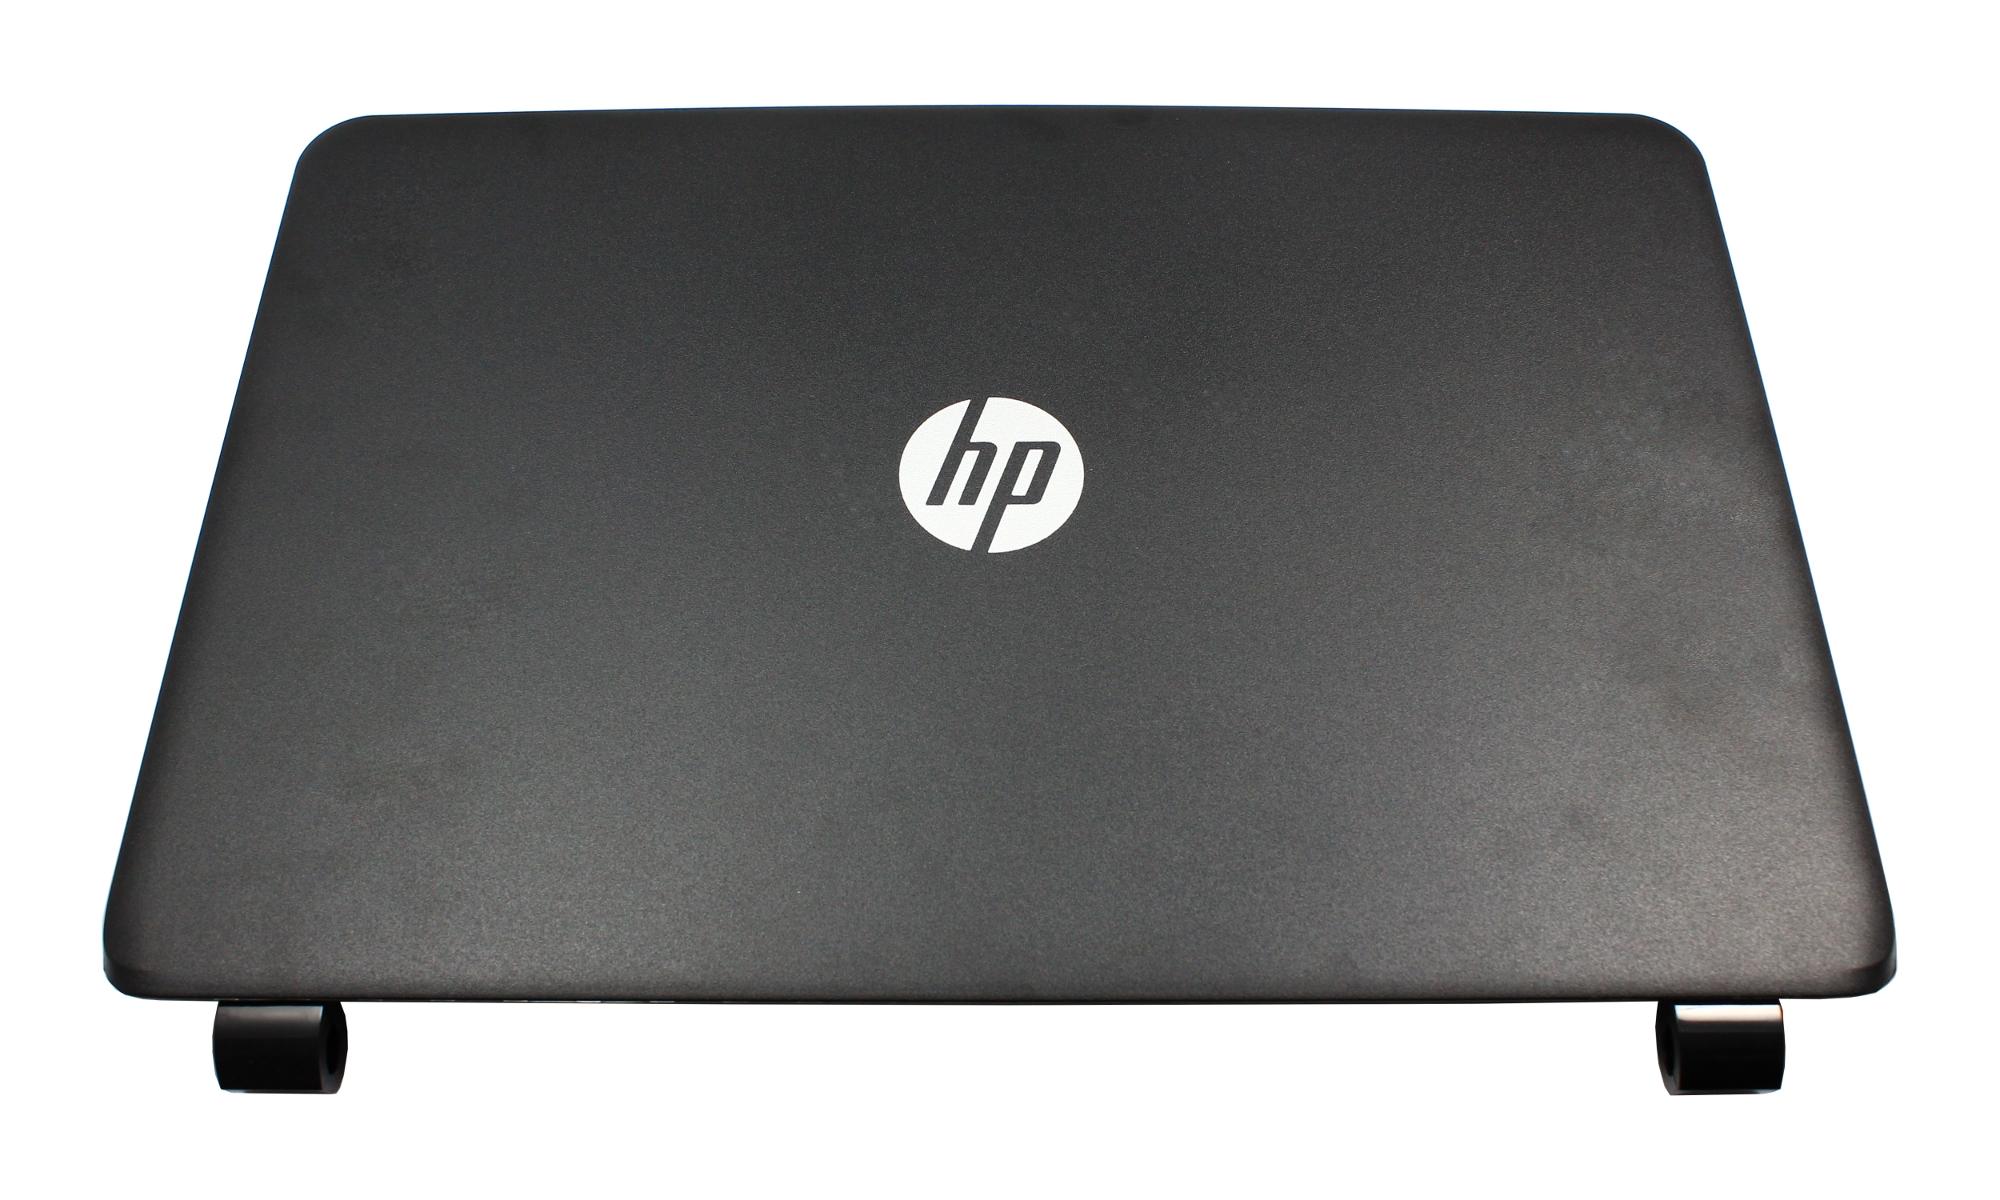 Ansamblu capac display, rama fata si balamale pentru HP 255 G3